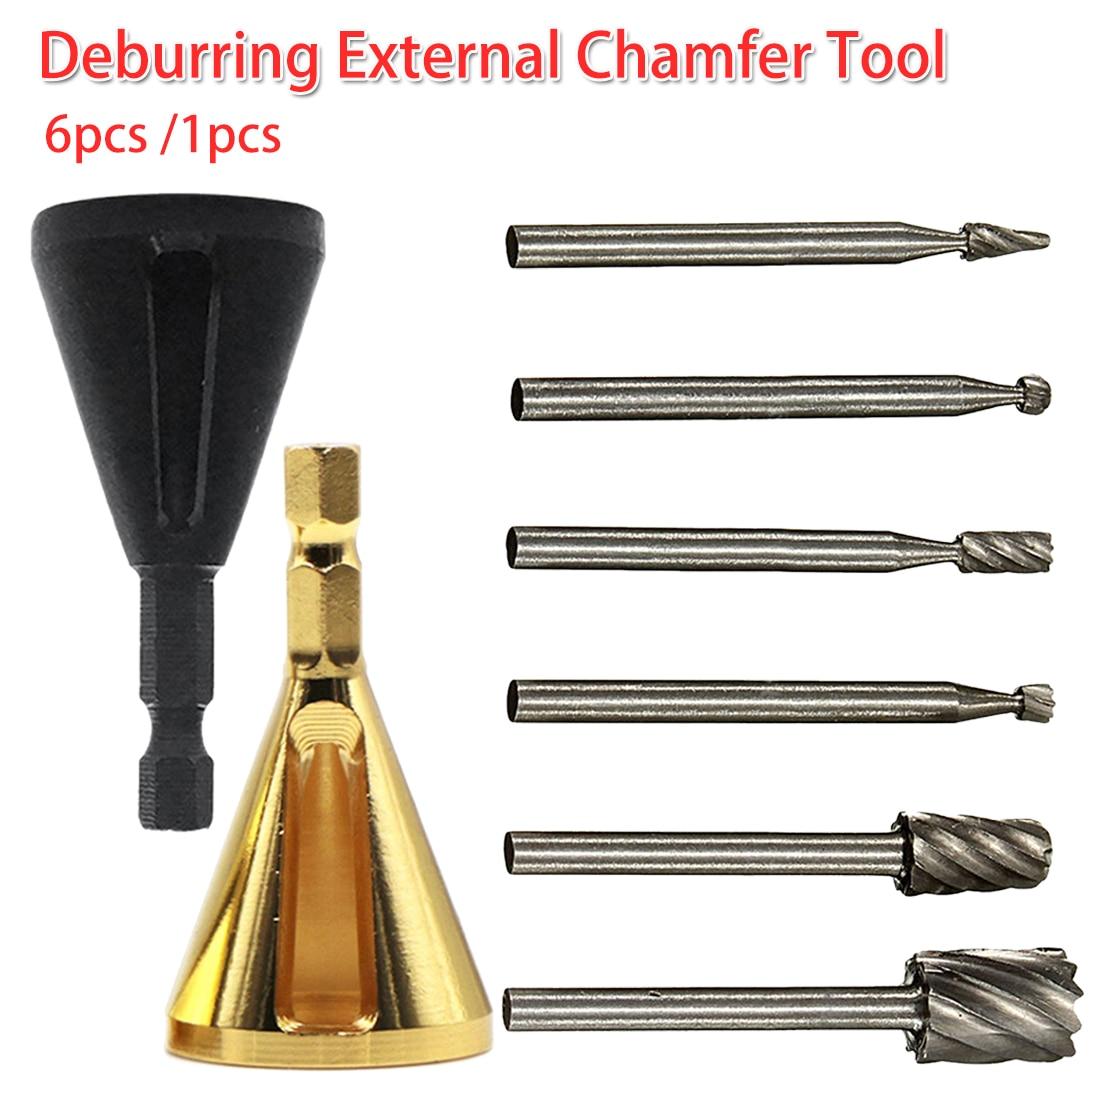 6pcs /1pcs Deburring External Chamfer Tool Bit Hardness Drill Bit Stainless Steel Remove Burr Multifunction Drill Removing Burr